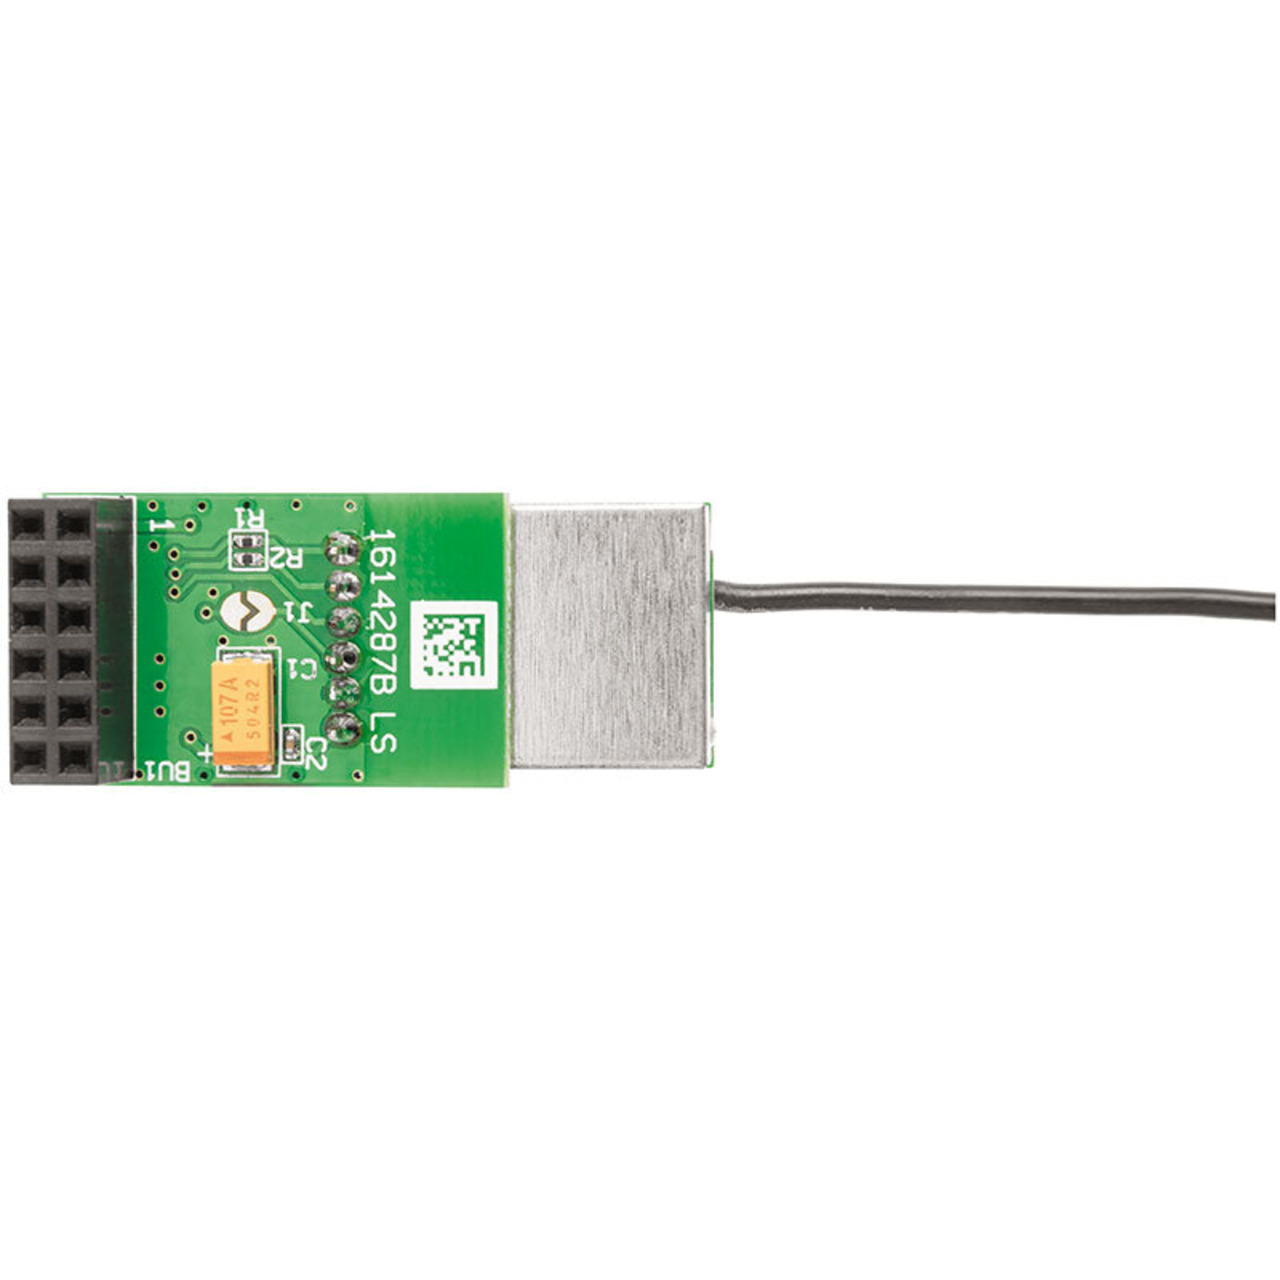 ELV Homematic Bausatz Funkmodul für Raspberry Pi HM-MOD-RPI-PCB